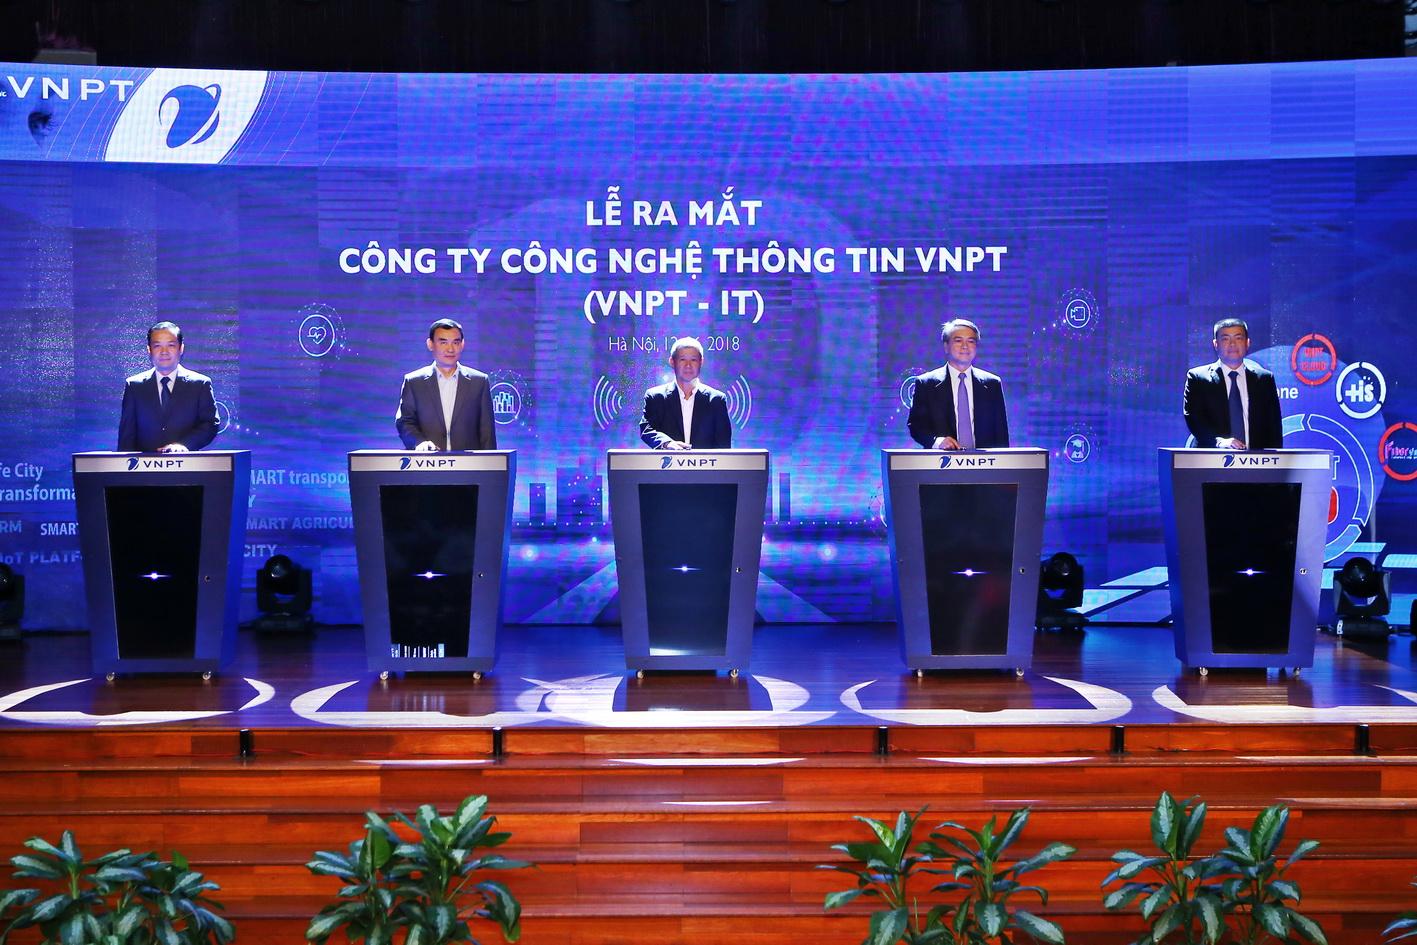 VNPT launches IT company